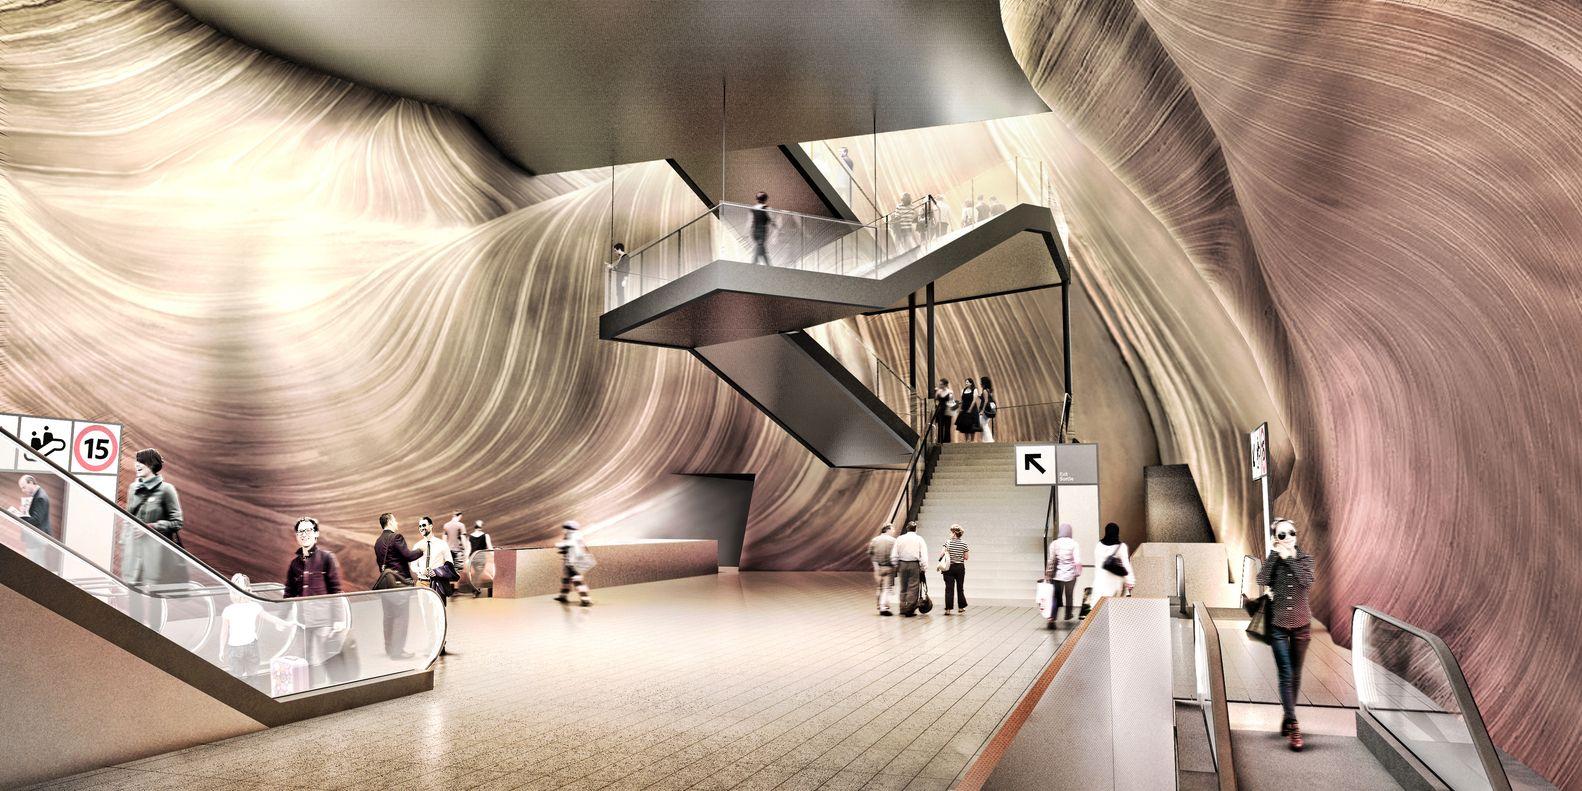 Atelier King Kong Unveils Designs for Grand Paris Express Metro Station,© atelier d'architecture KingKong